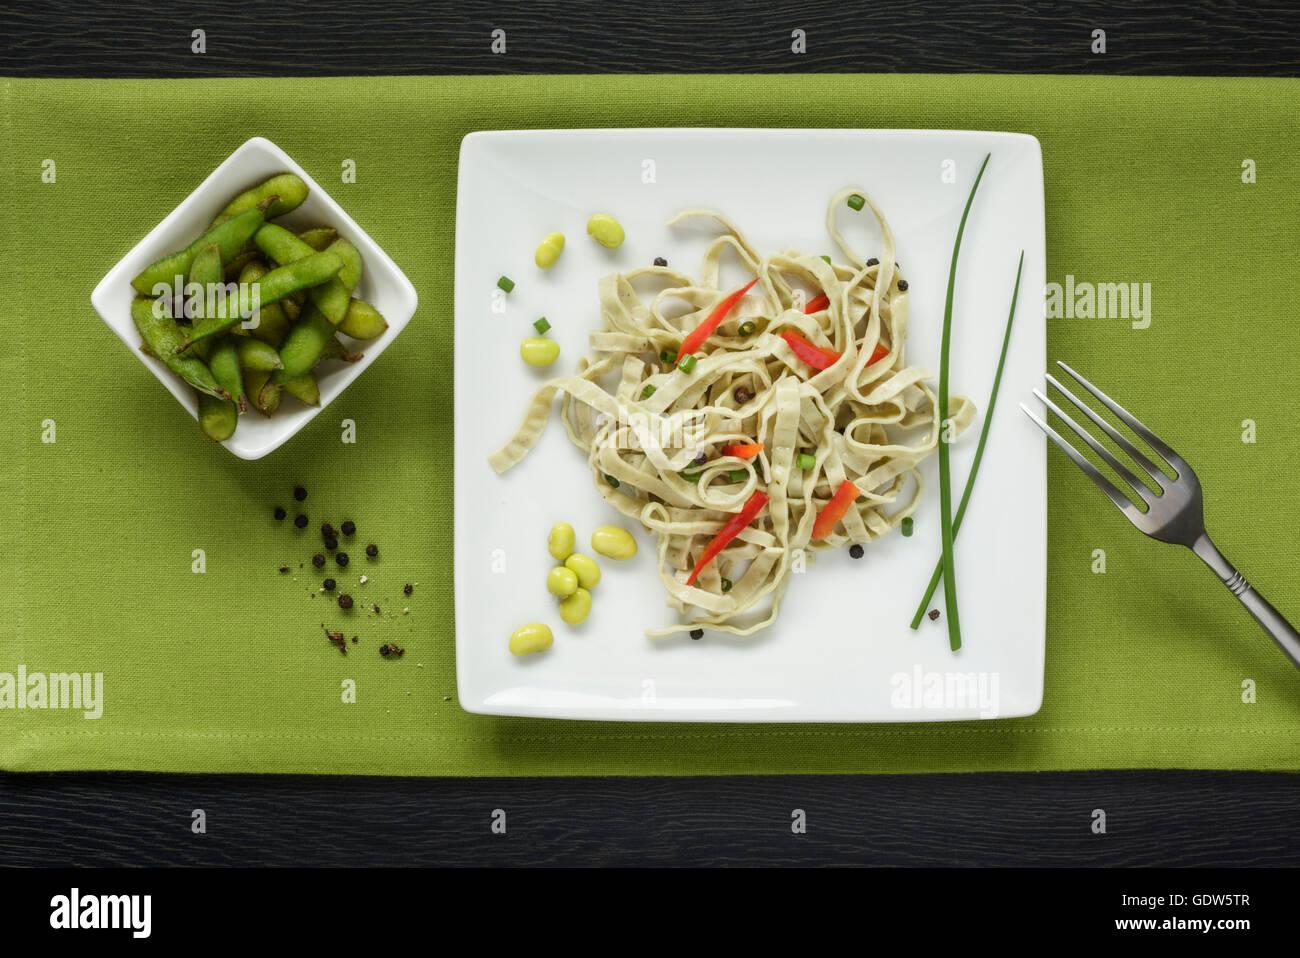 Edamame Beans and Edamame Pasta Salad - Stock Image